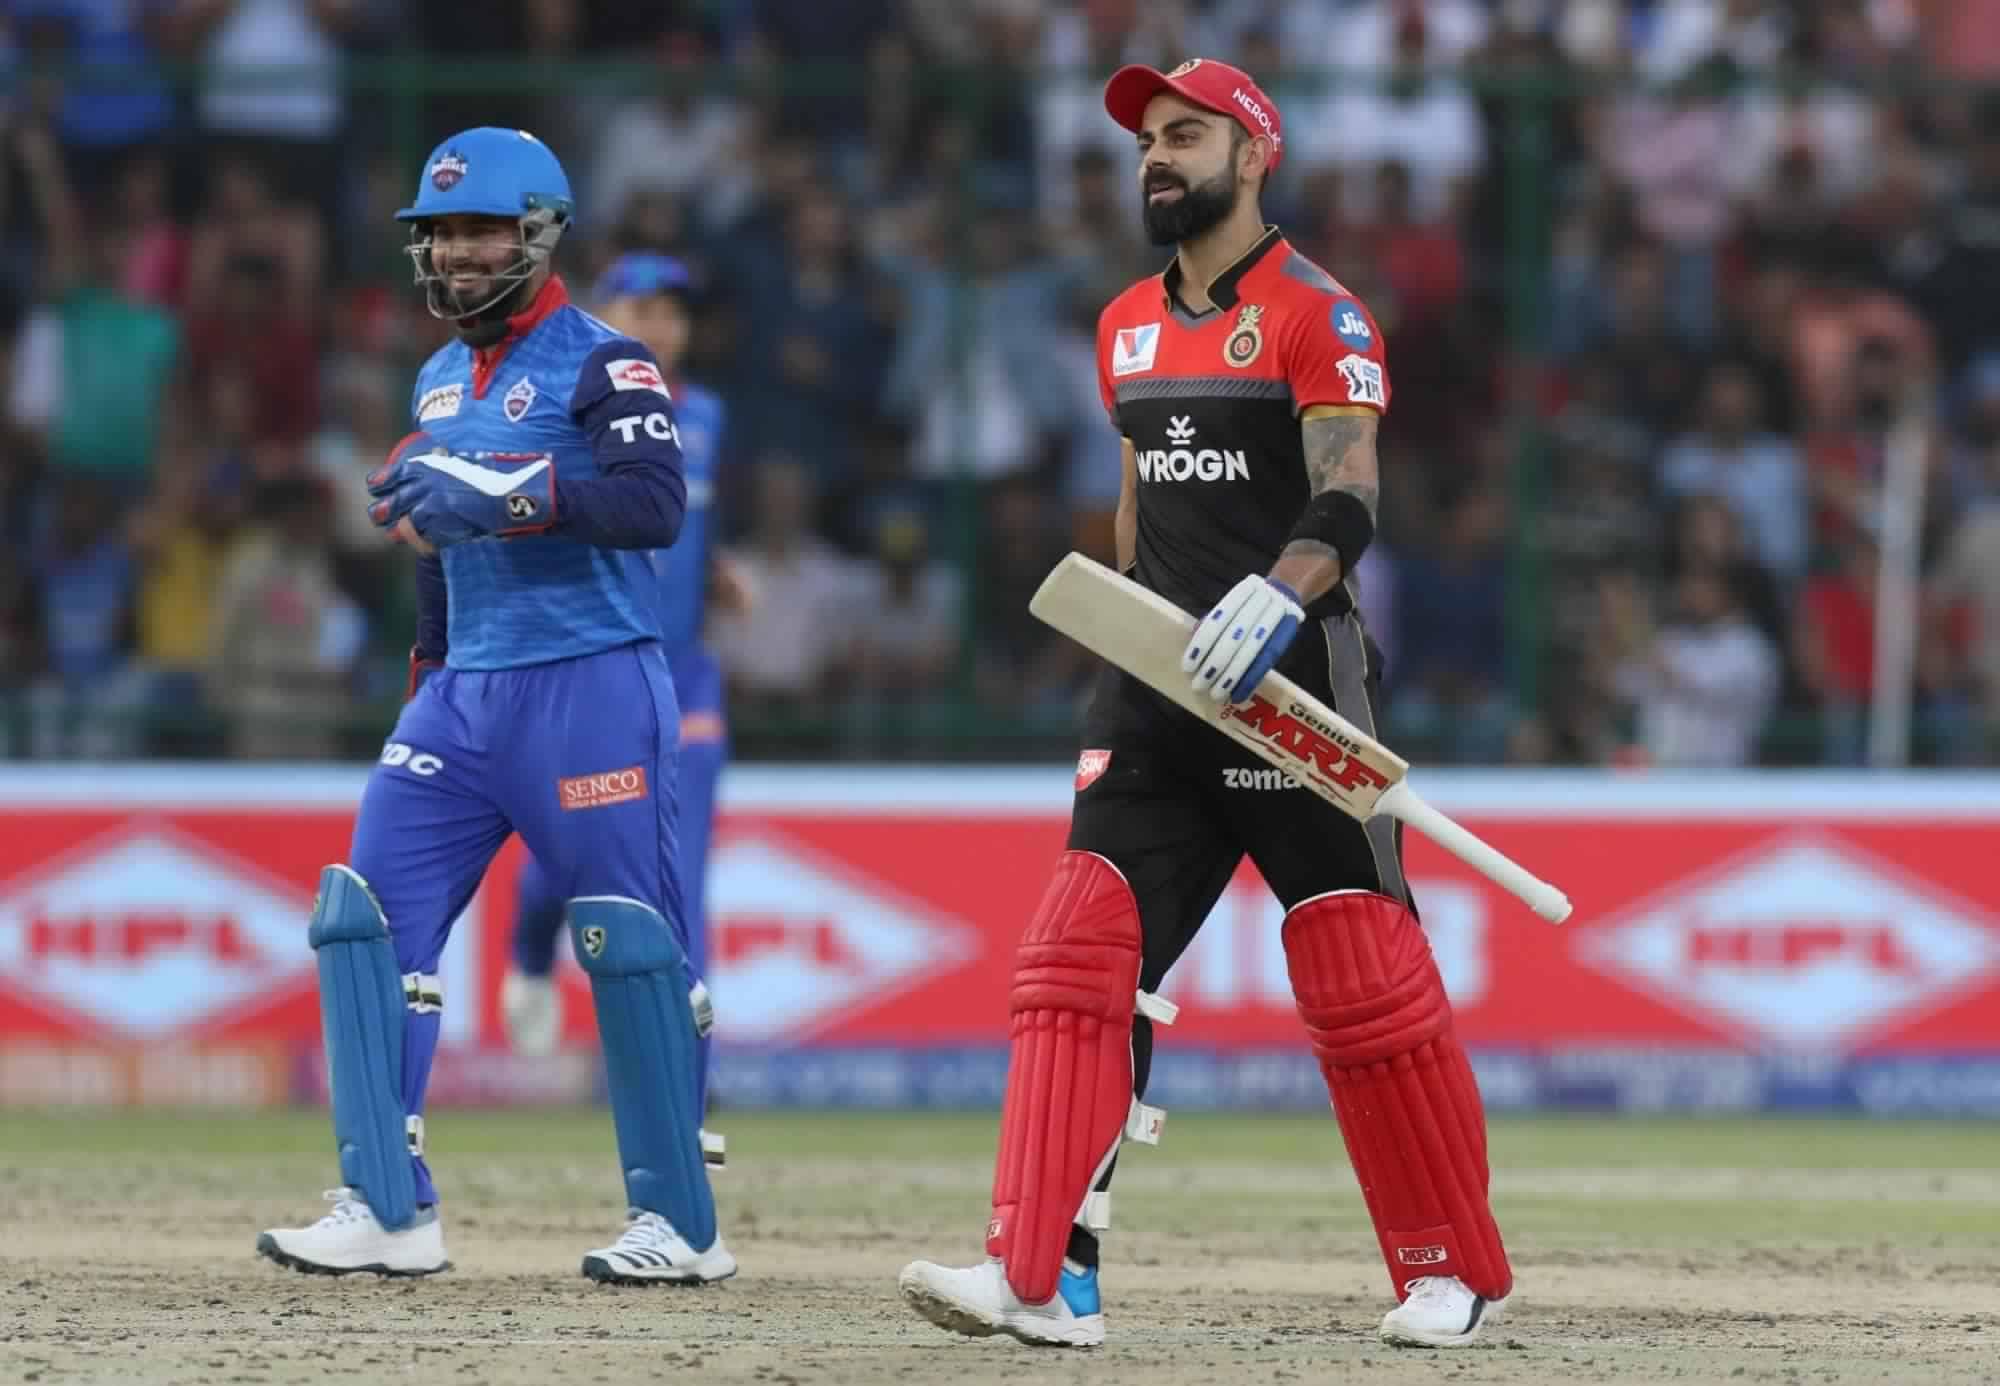 IPL 2021: DC vs RCB – Match 22, Match Prediction